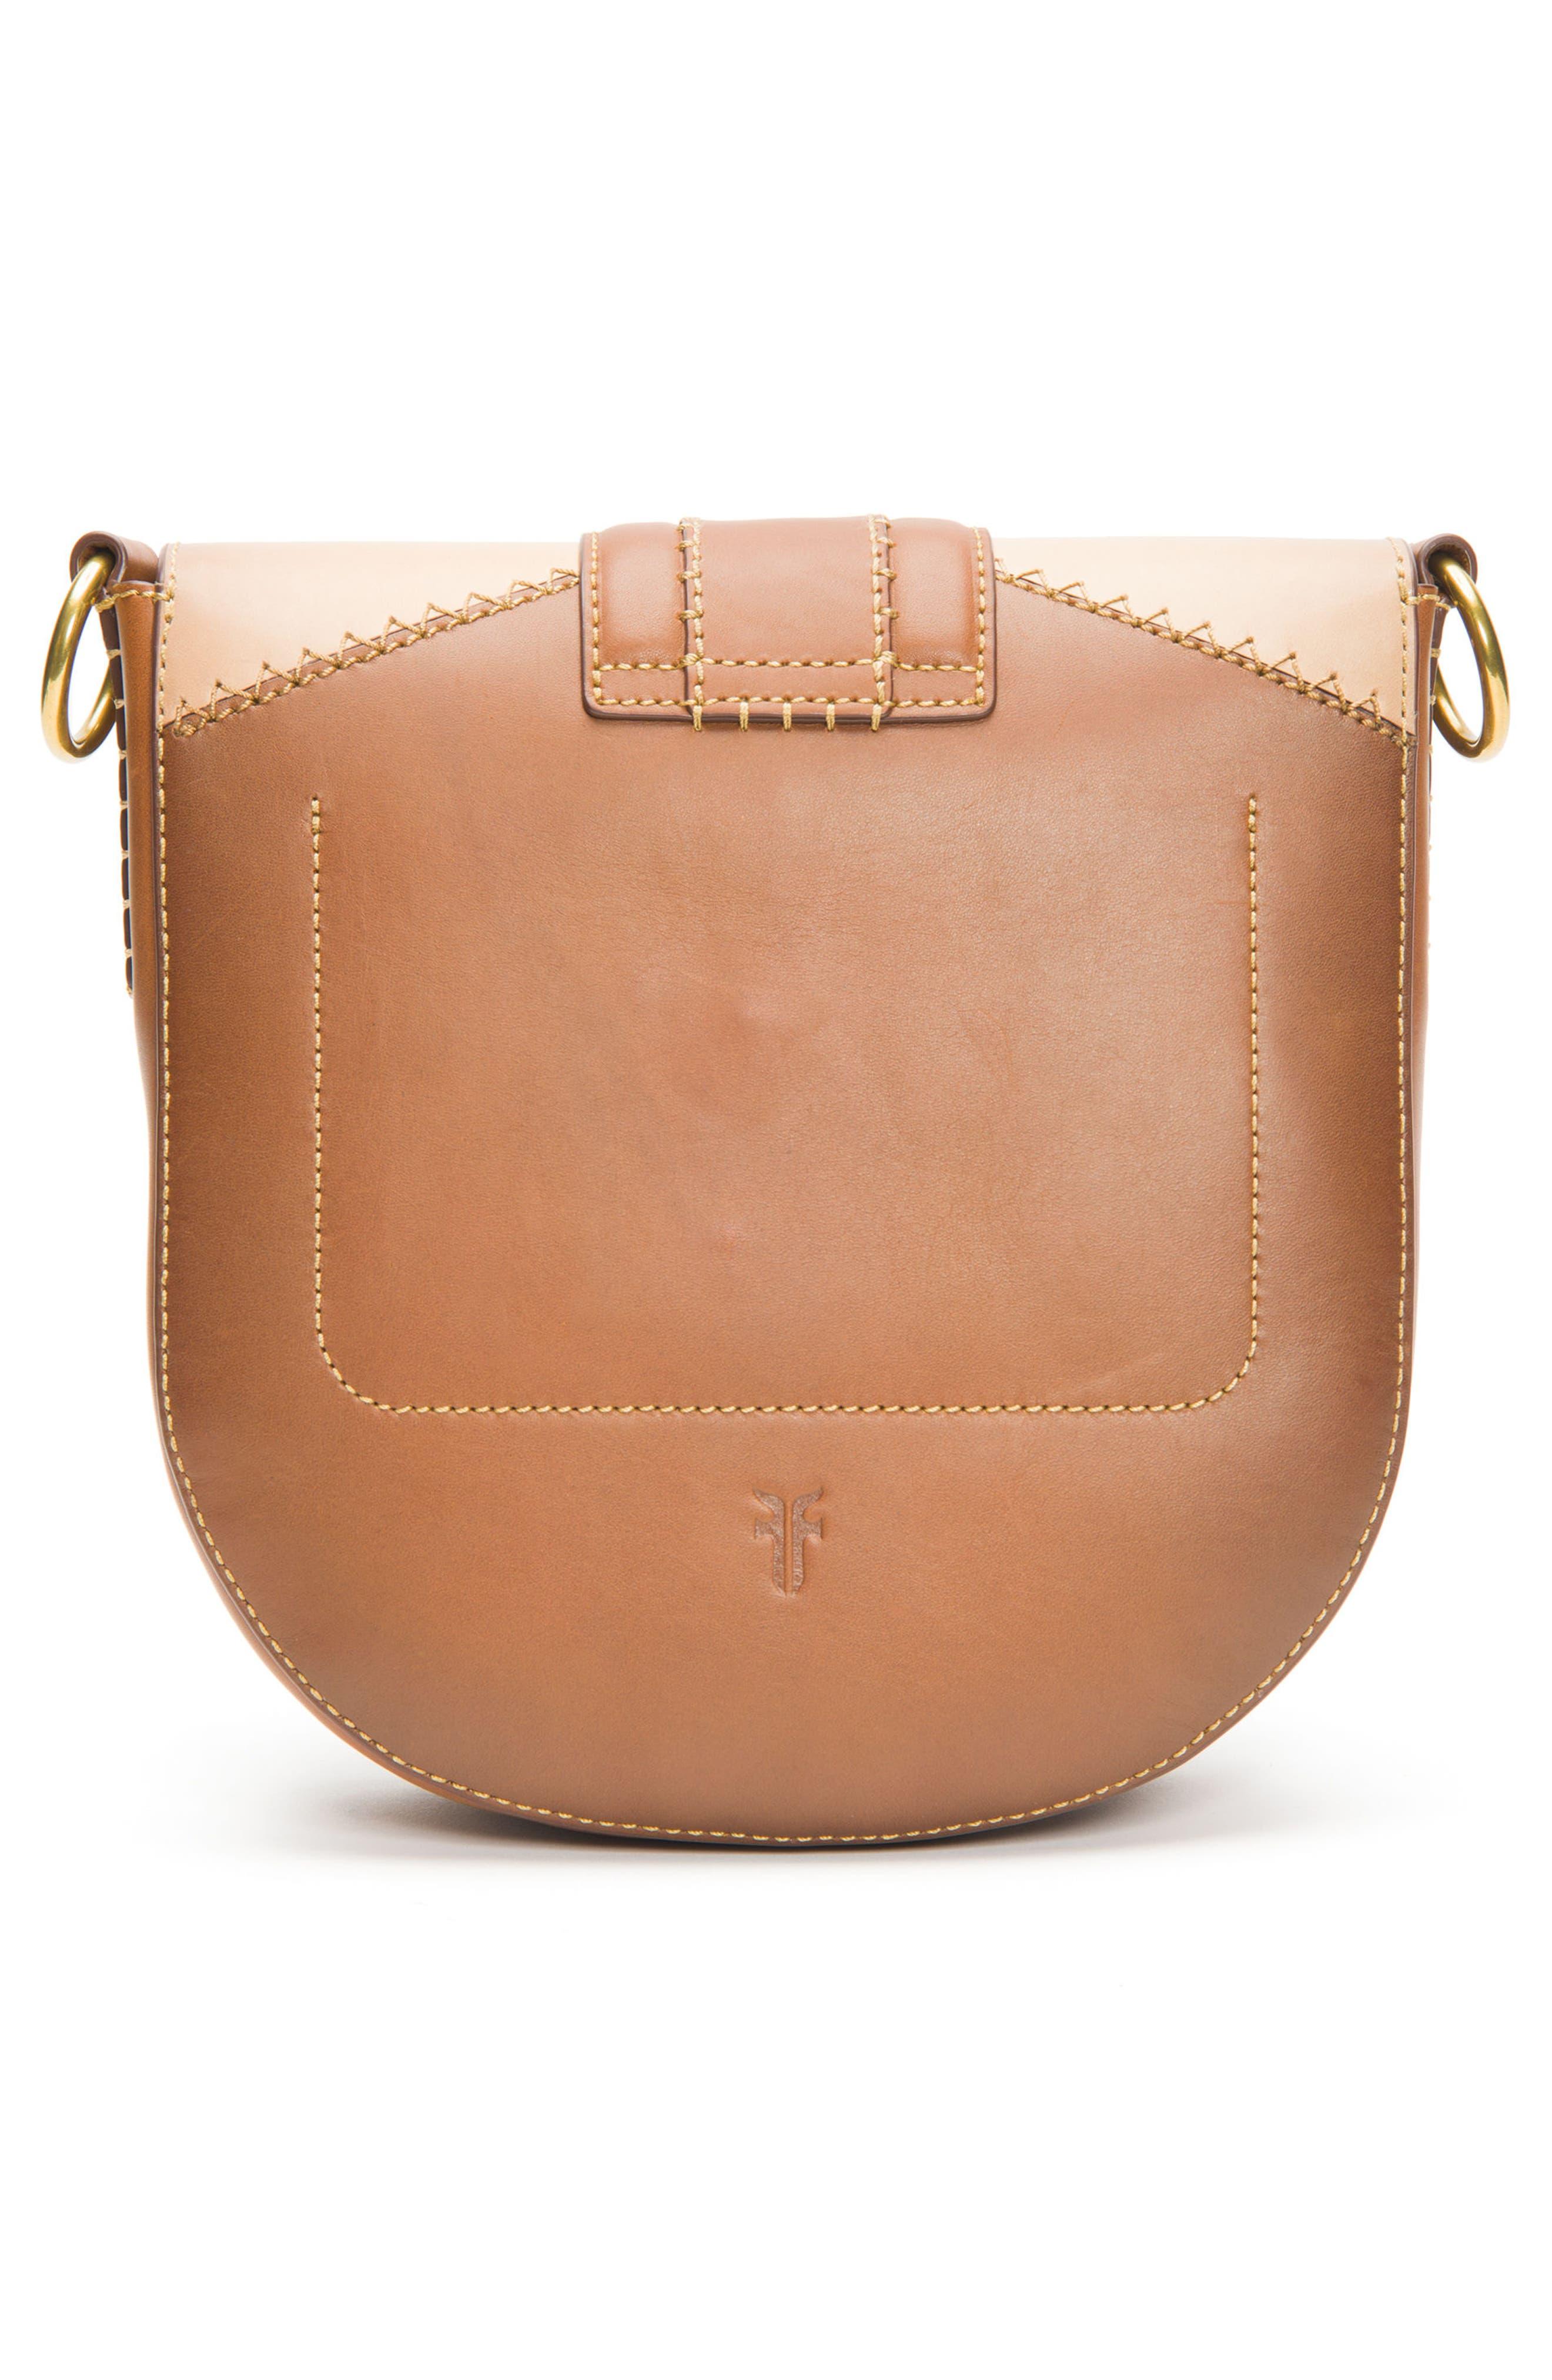 Ilana Colorblock Leather Saddle Bag,                             Alternate thumbnail 3, color,                             200